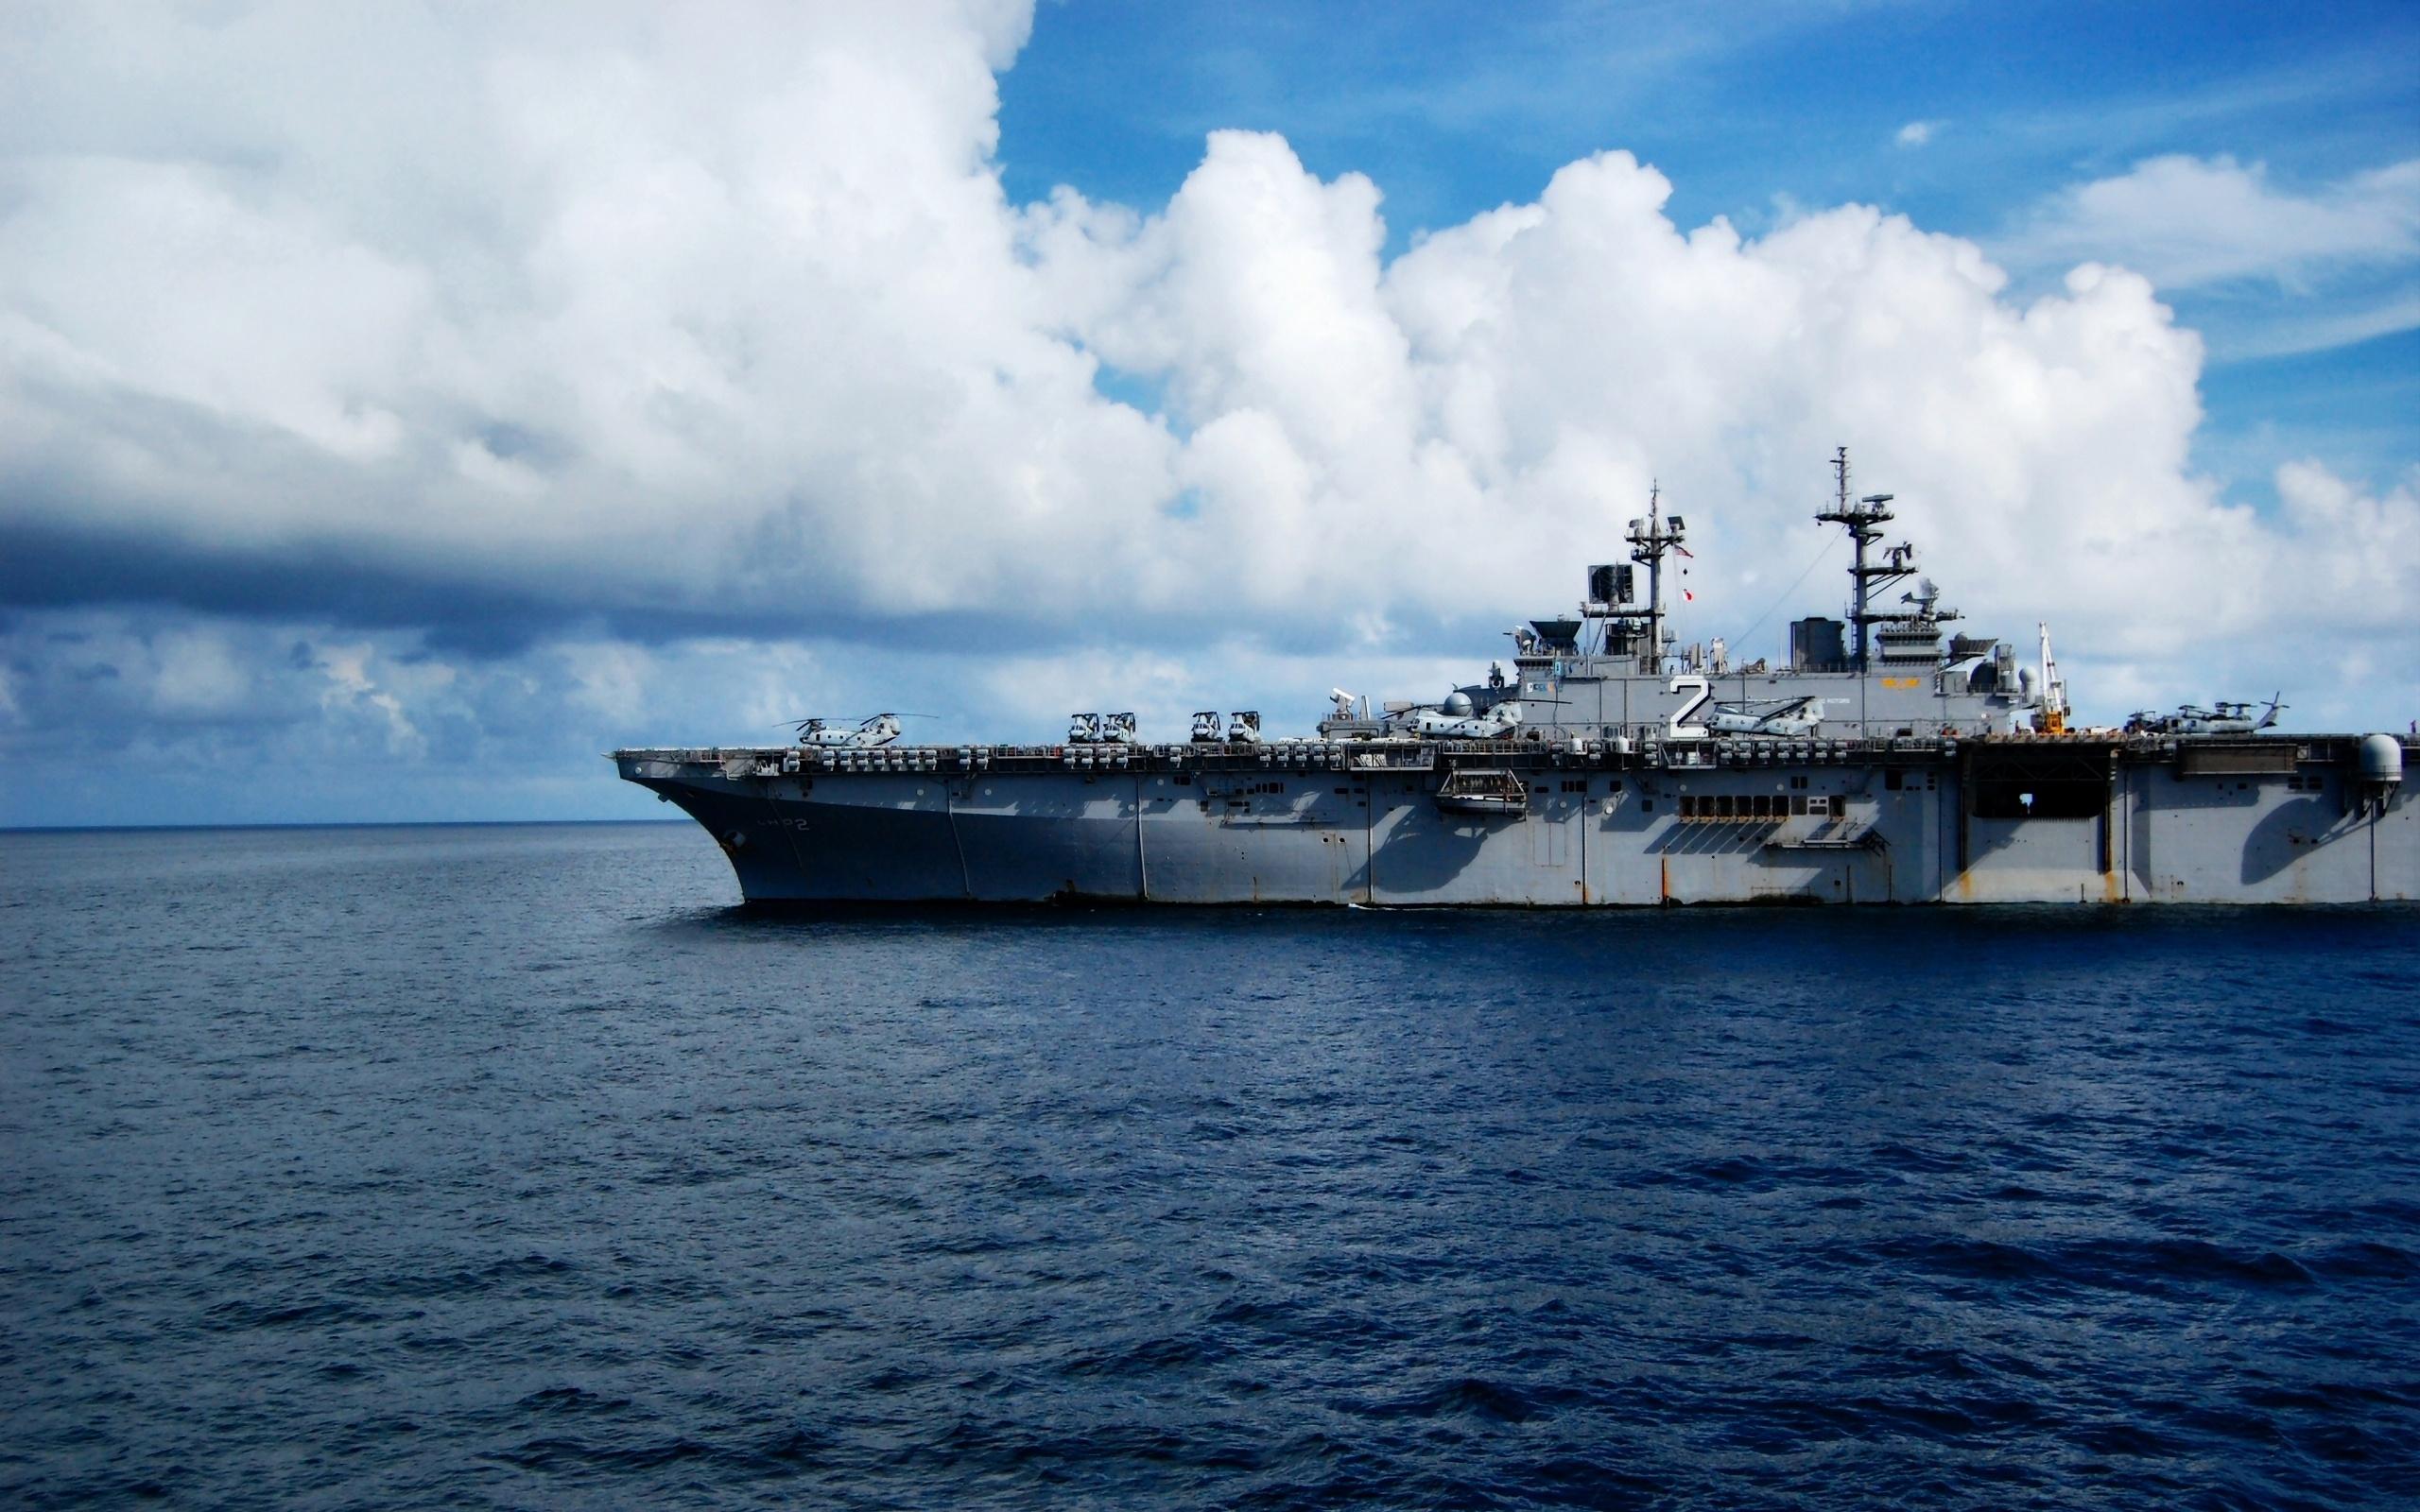 navy wallpaper 1440x900 ships - photo #14